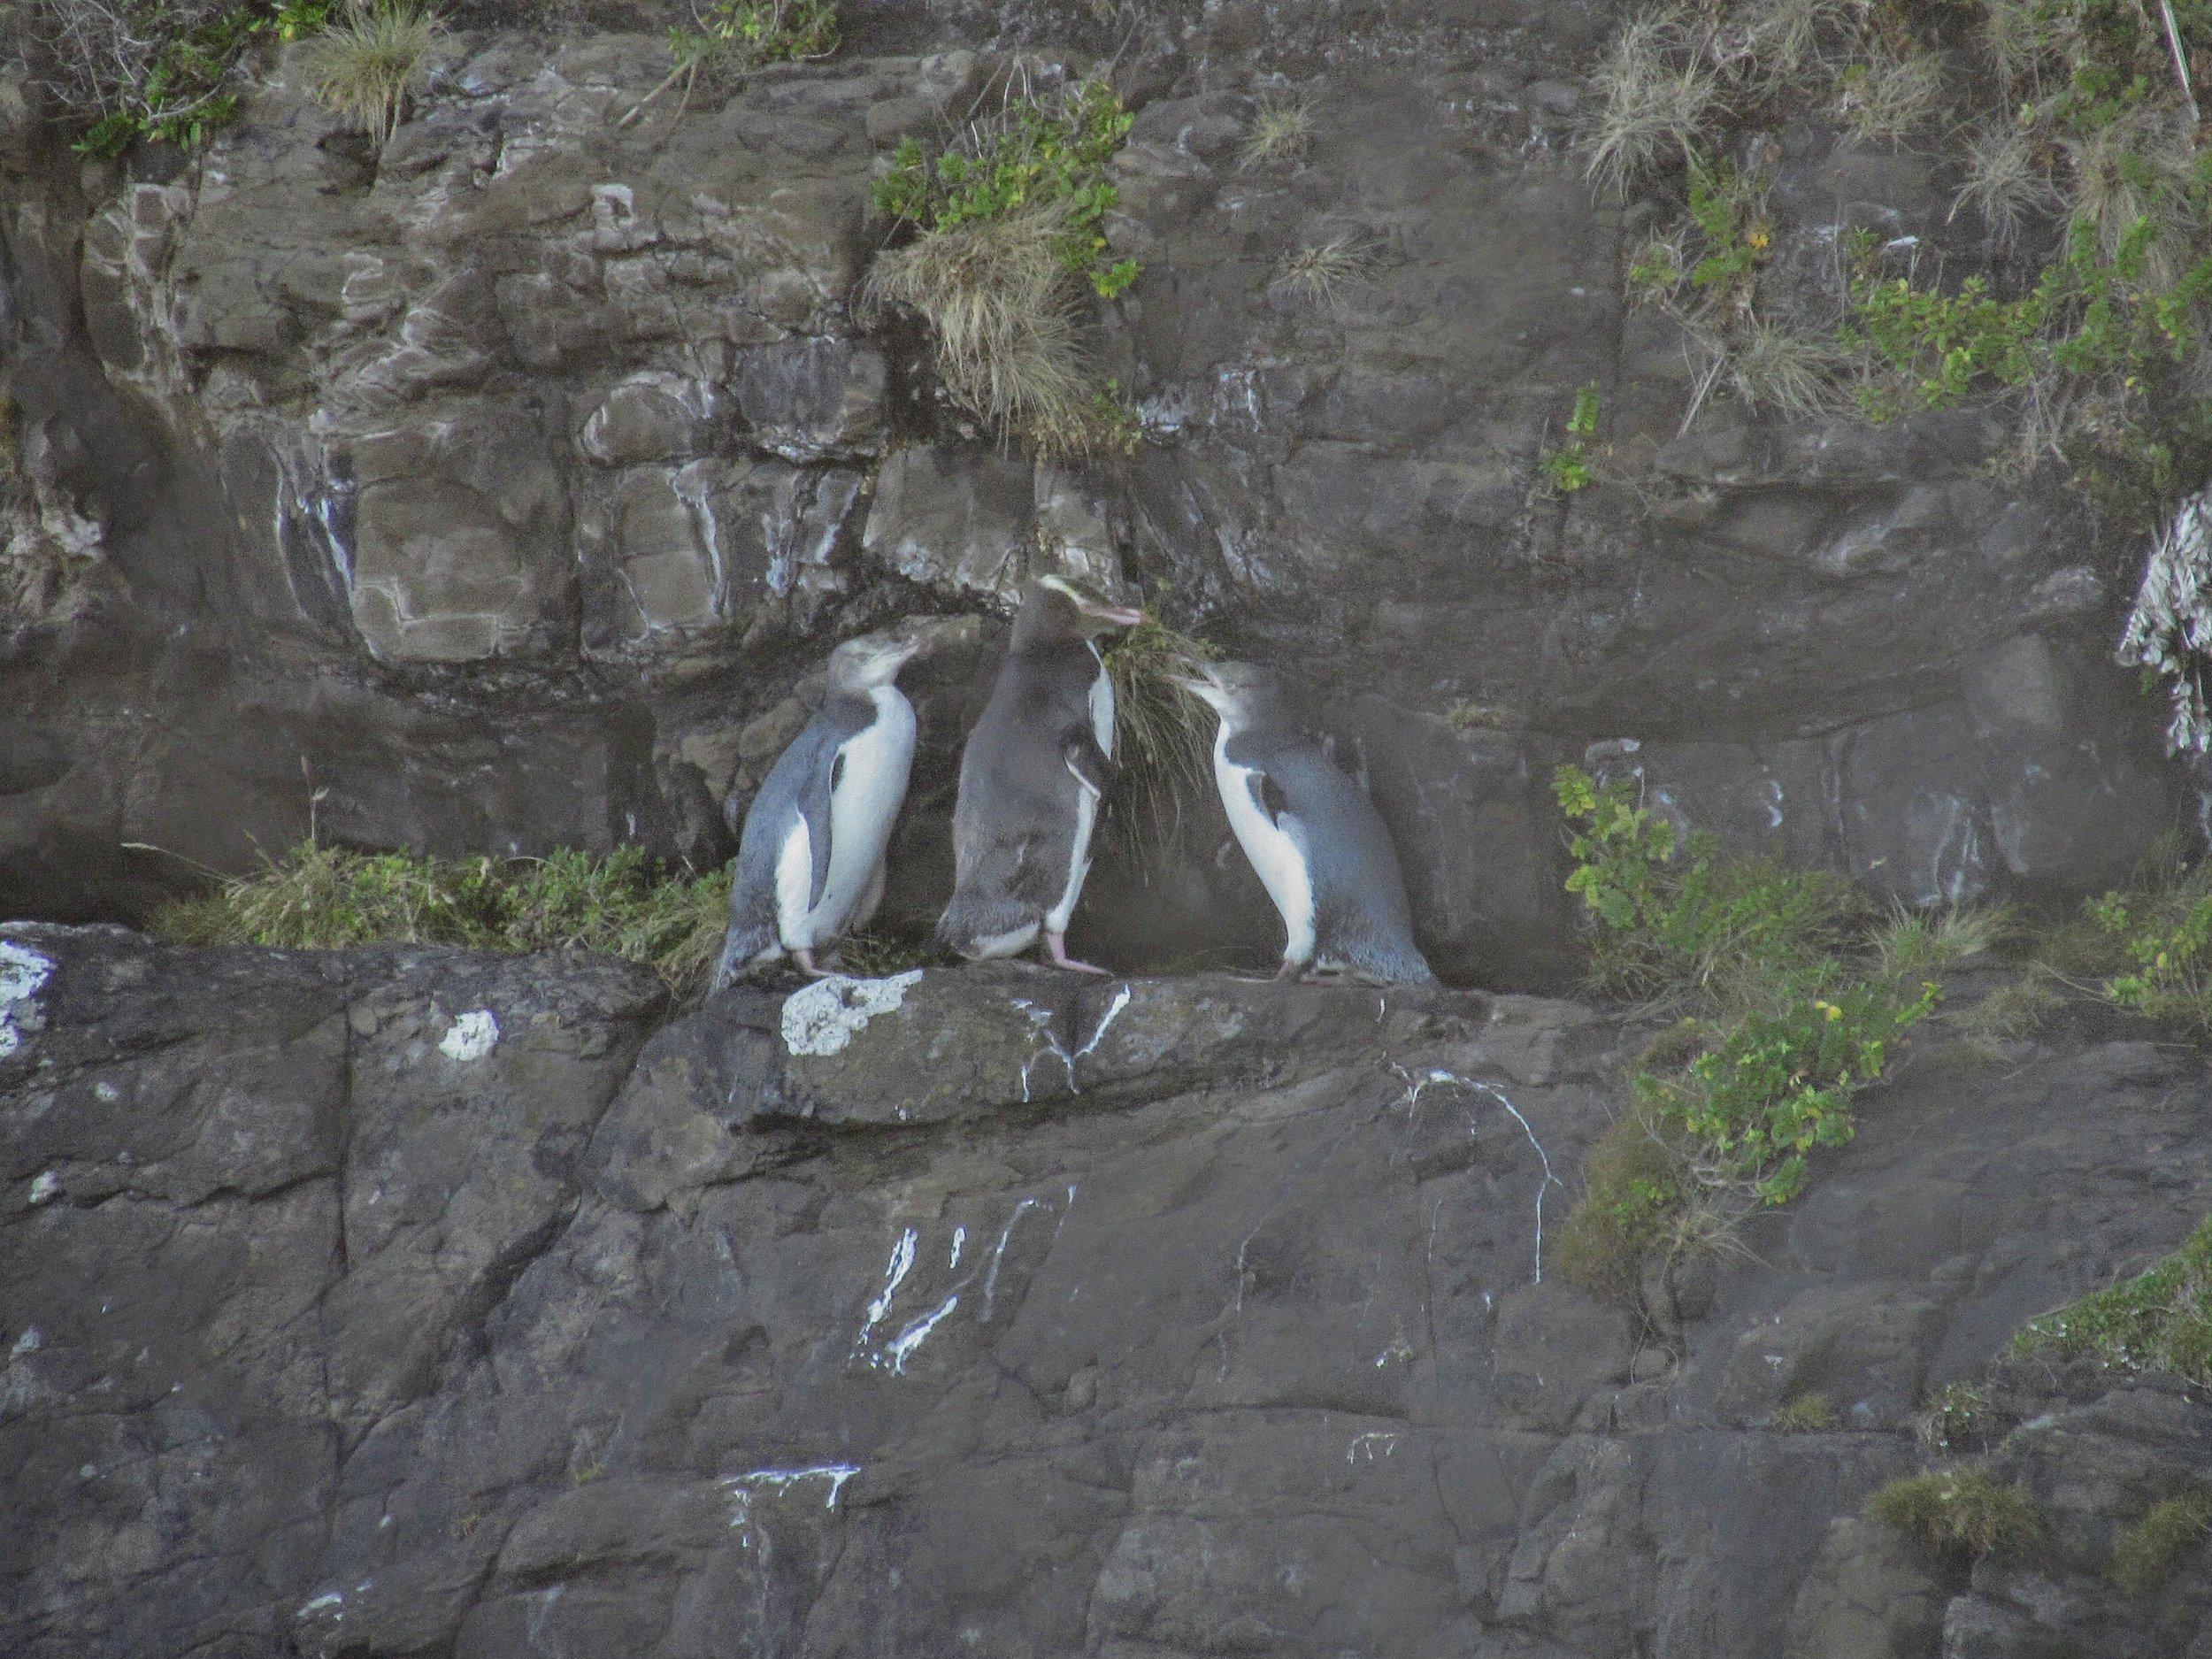 Yellow-Eyed Penguins at Curio Bay, New Zealand